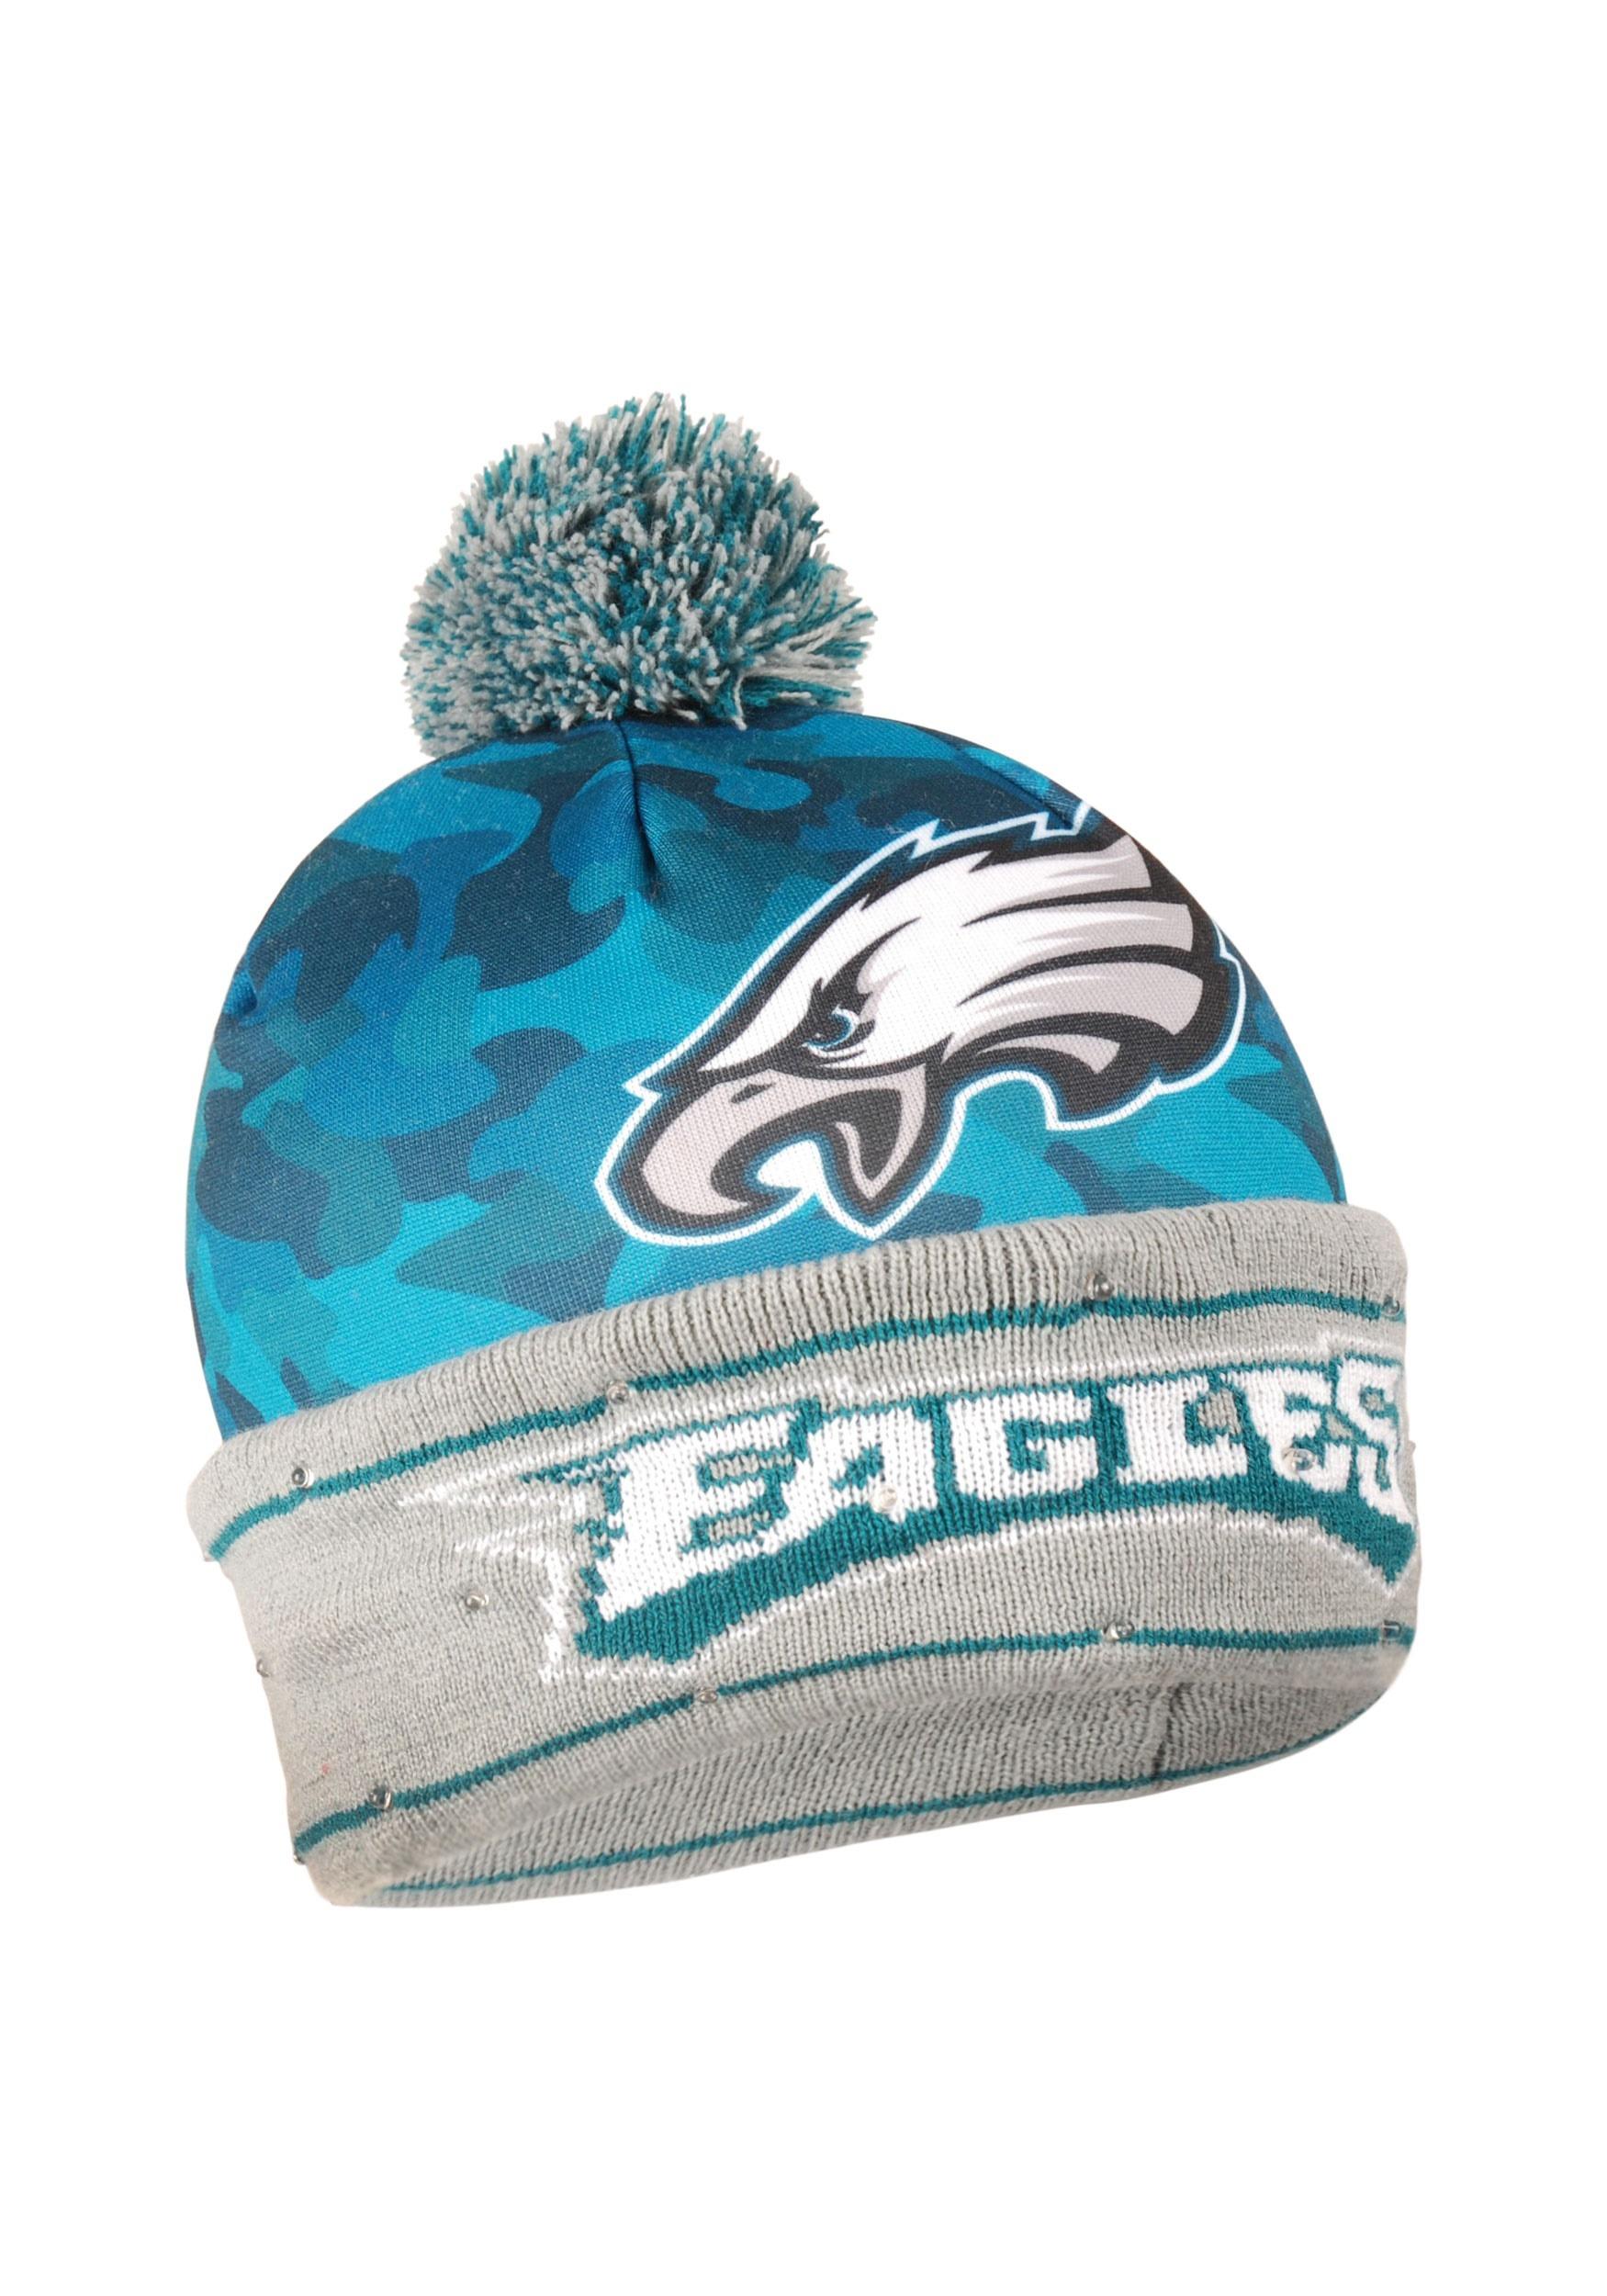 NFL Philadelphia Eagles Camouflage Light Up Printed Stocking Hat 716d972e91a